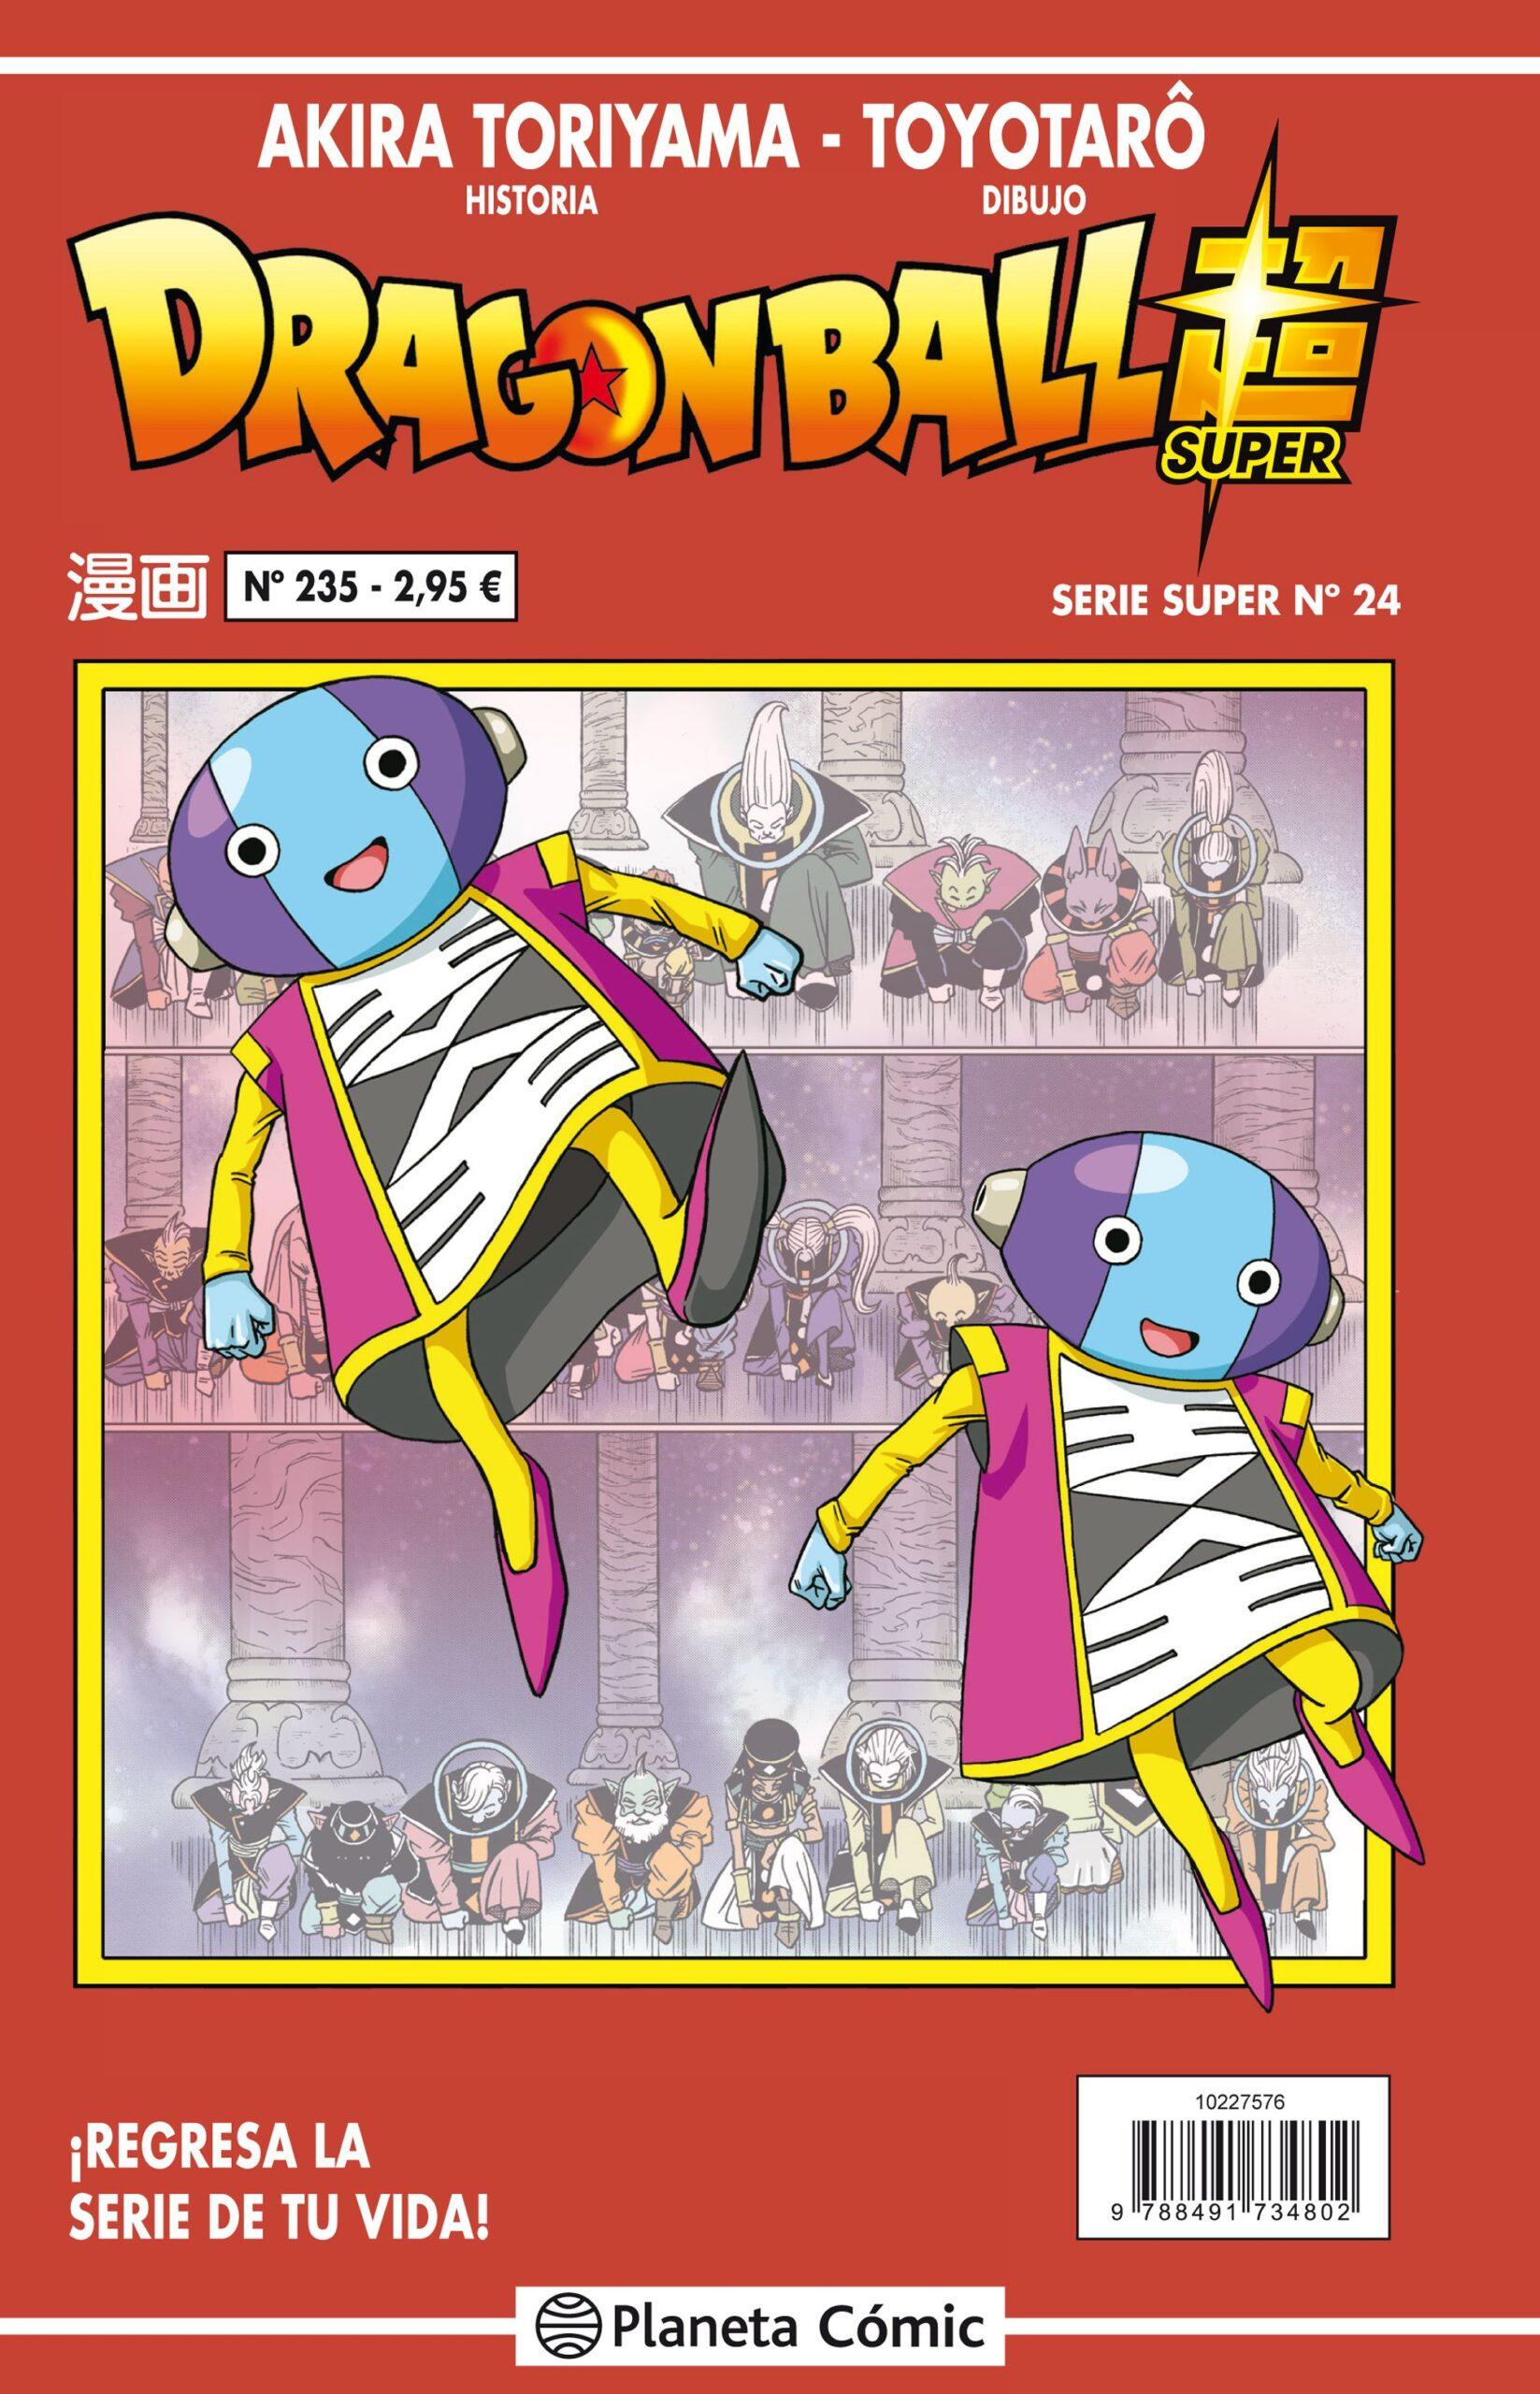 'Dragon Ball Super' 24 / 235 Serie Roja. Reseña del manga